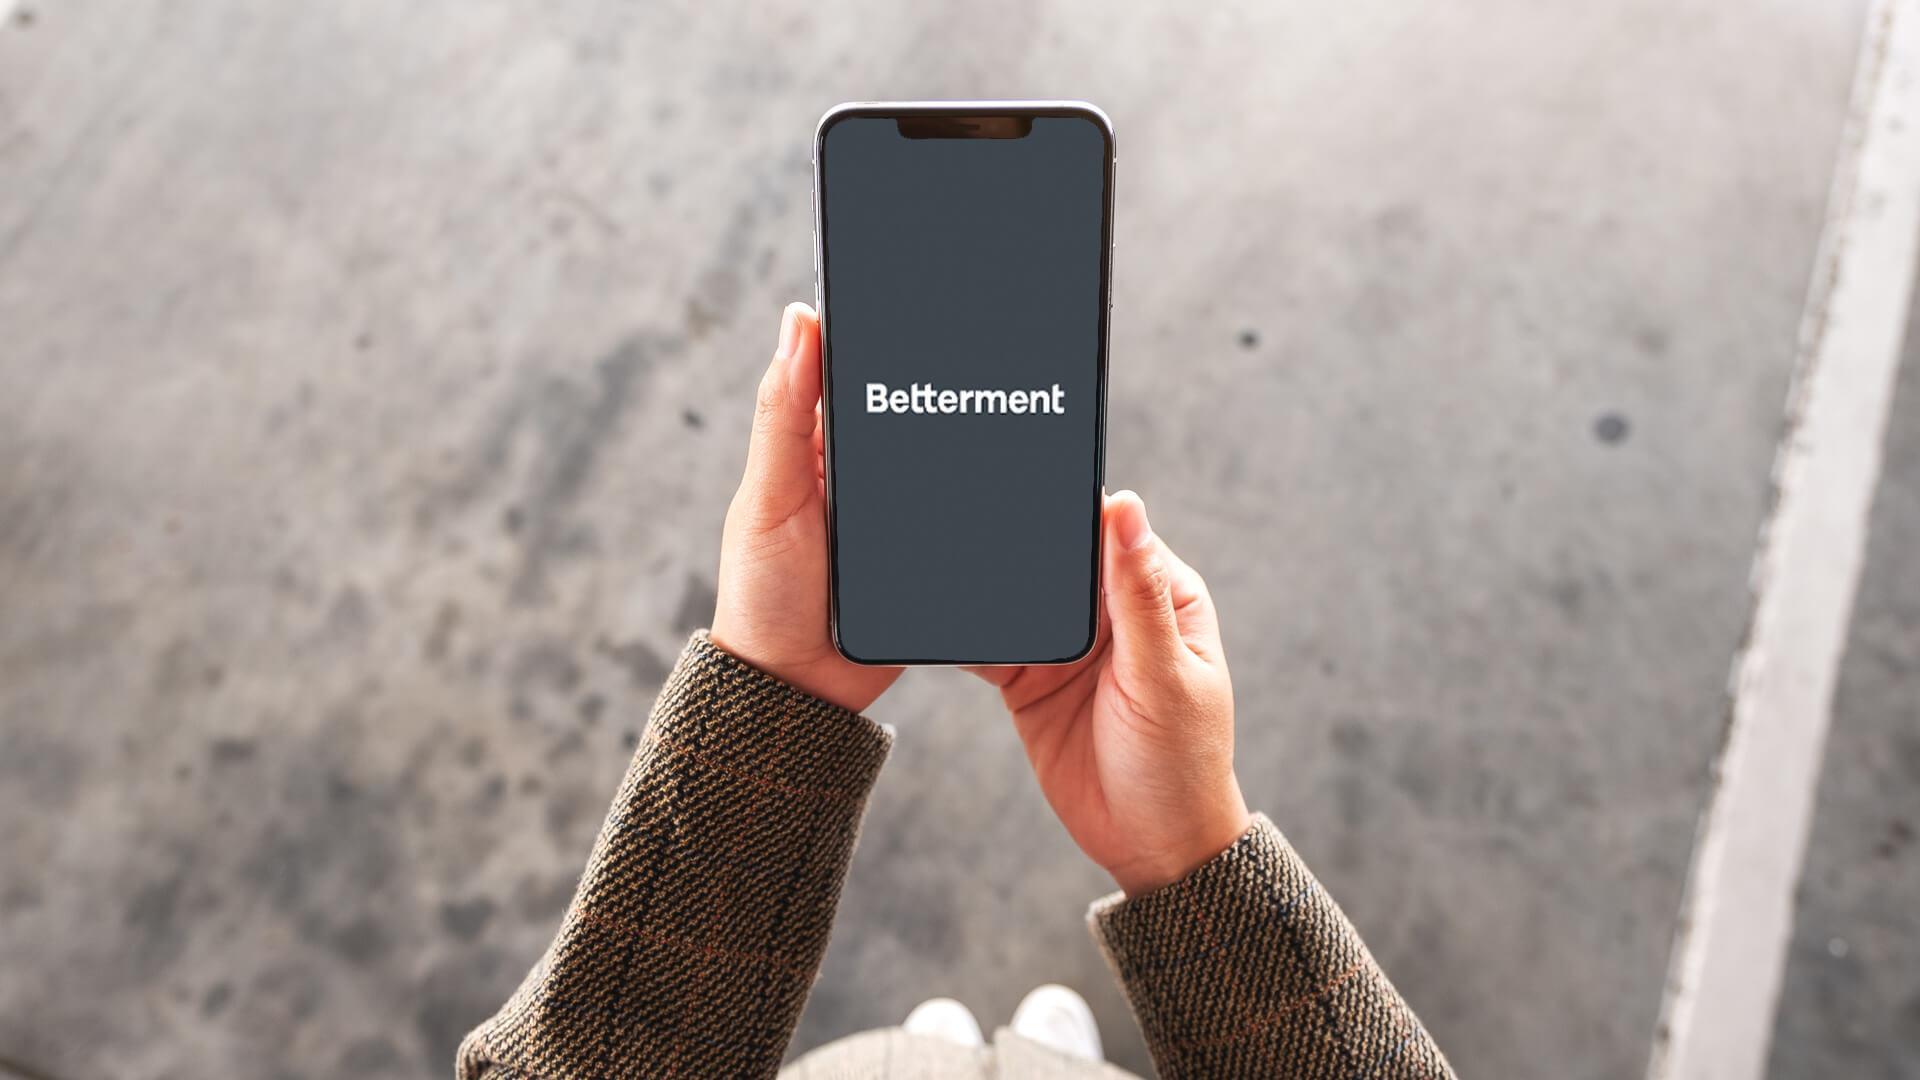 Betterment investment banking app